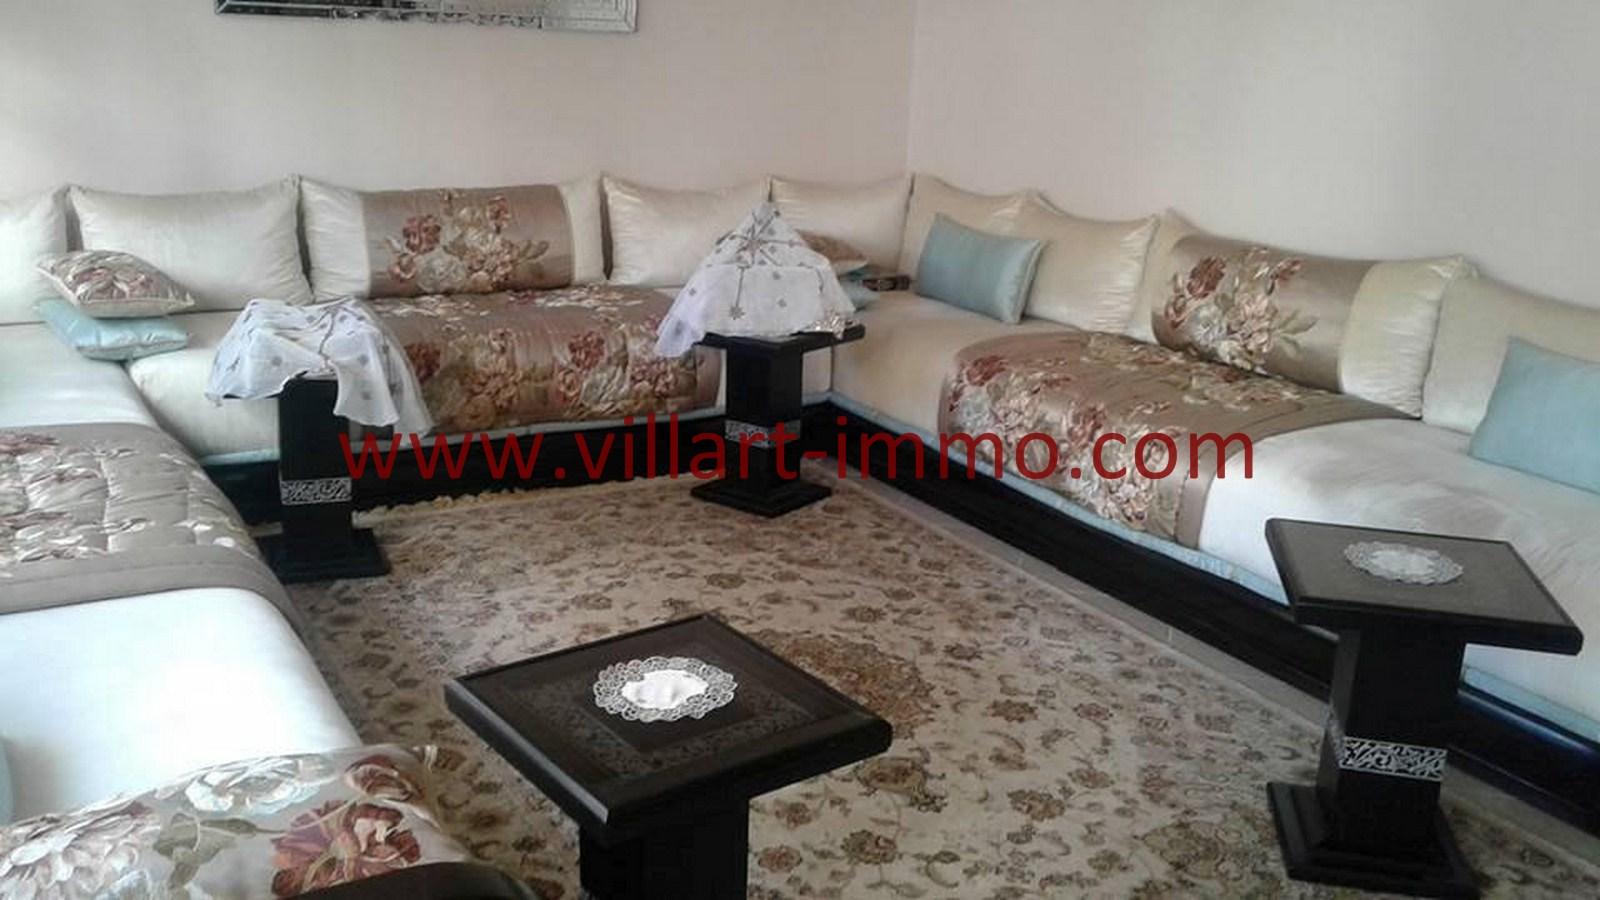 1-Vente-Appartement-Tanger-Route-de-Rabat-Salon 1-VA476-Villart Immo